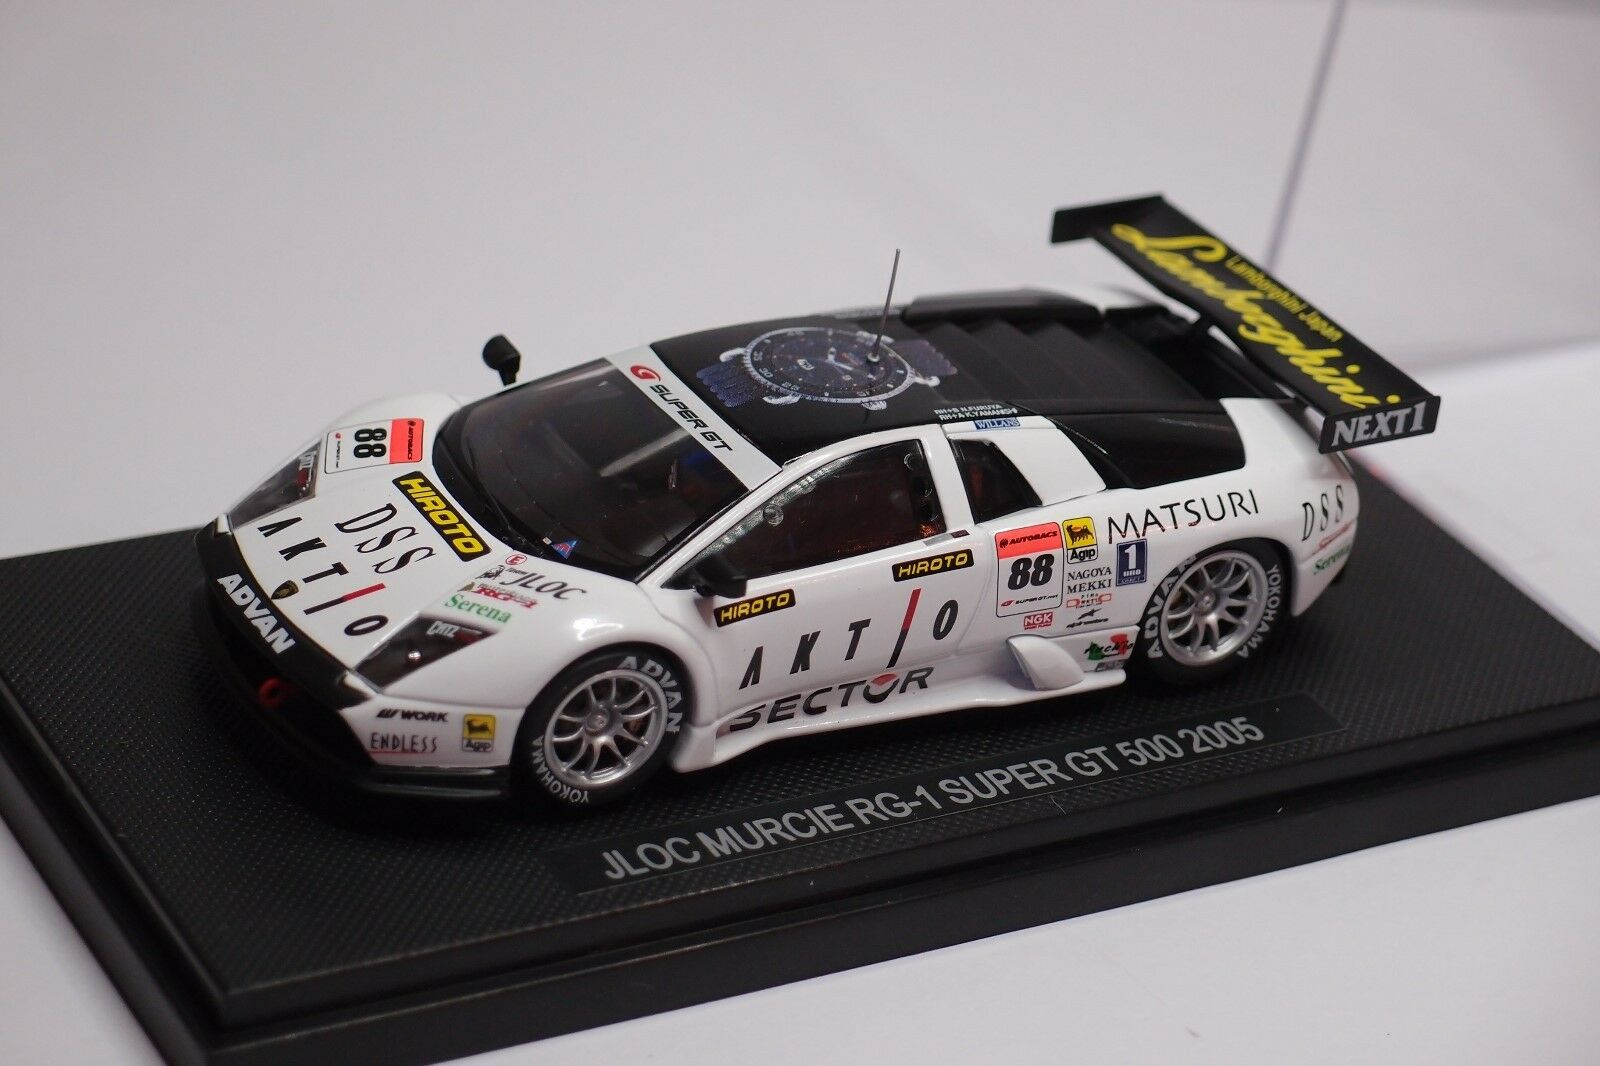 EBBRO LAMBORGHINI JLOC MURCIE RG-1  88 88 88 SUPER GT500 2005 1 43 c05b7a